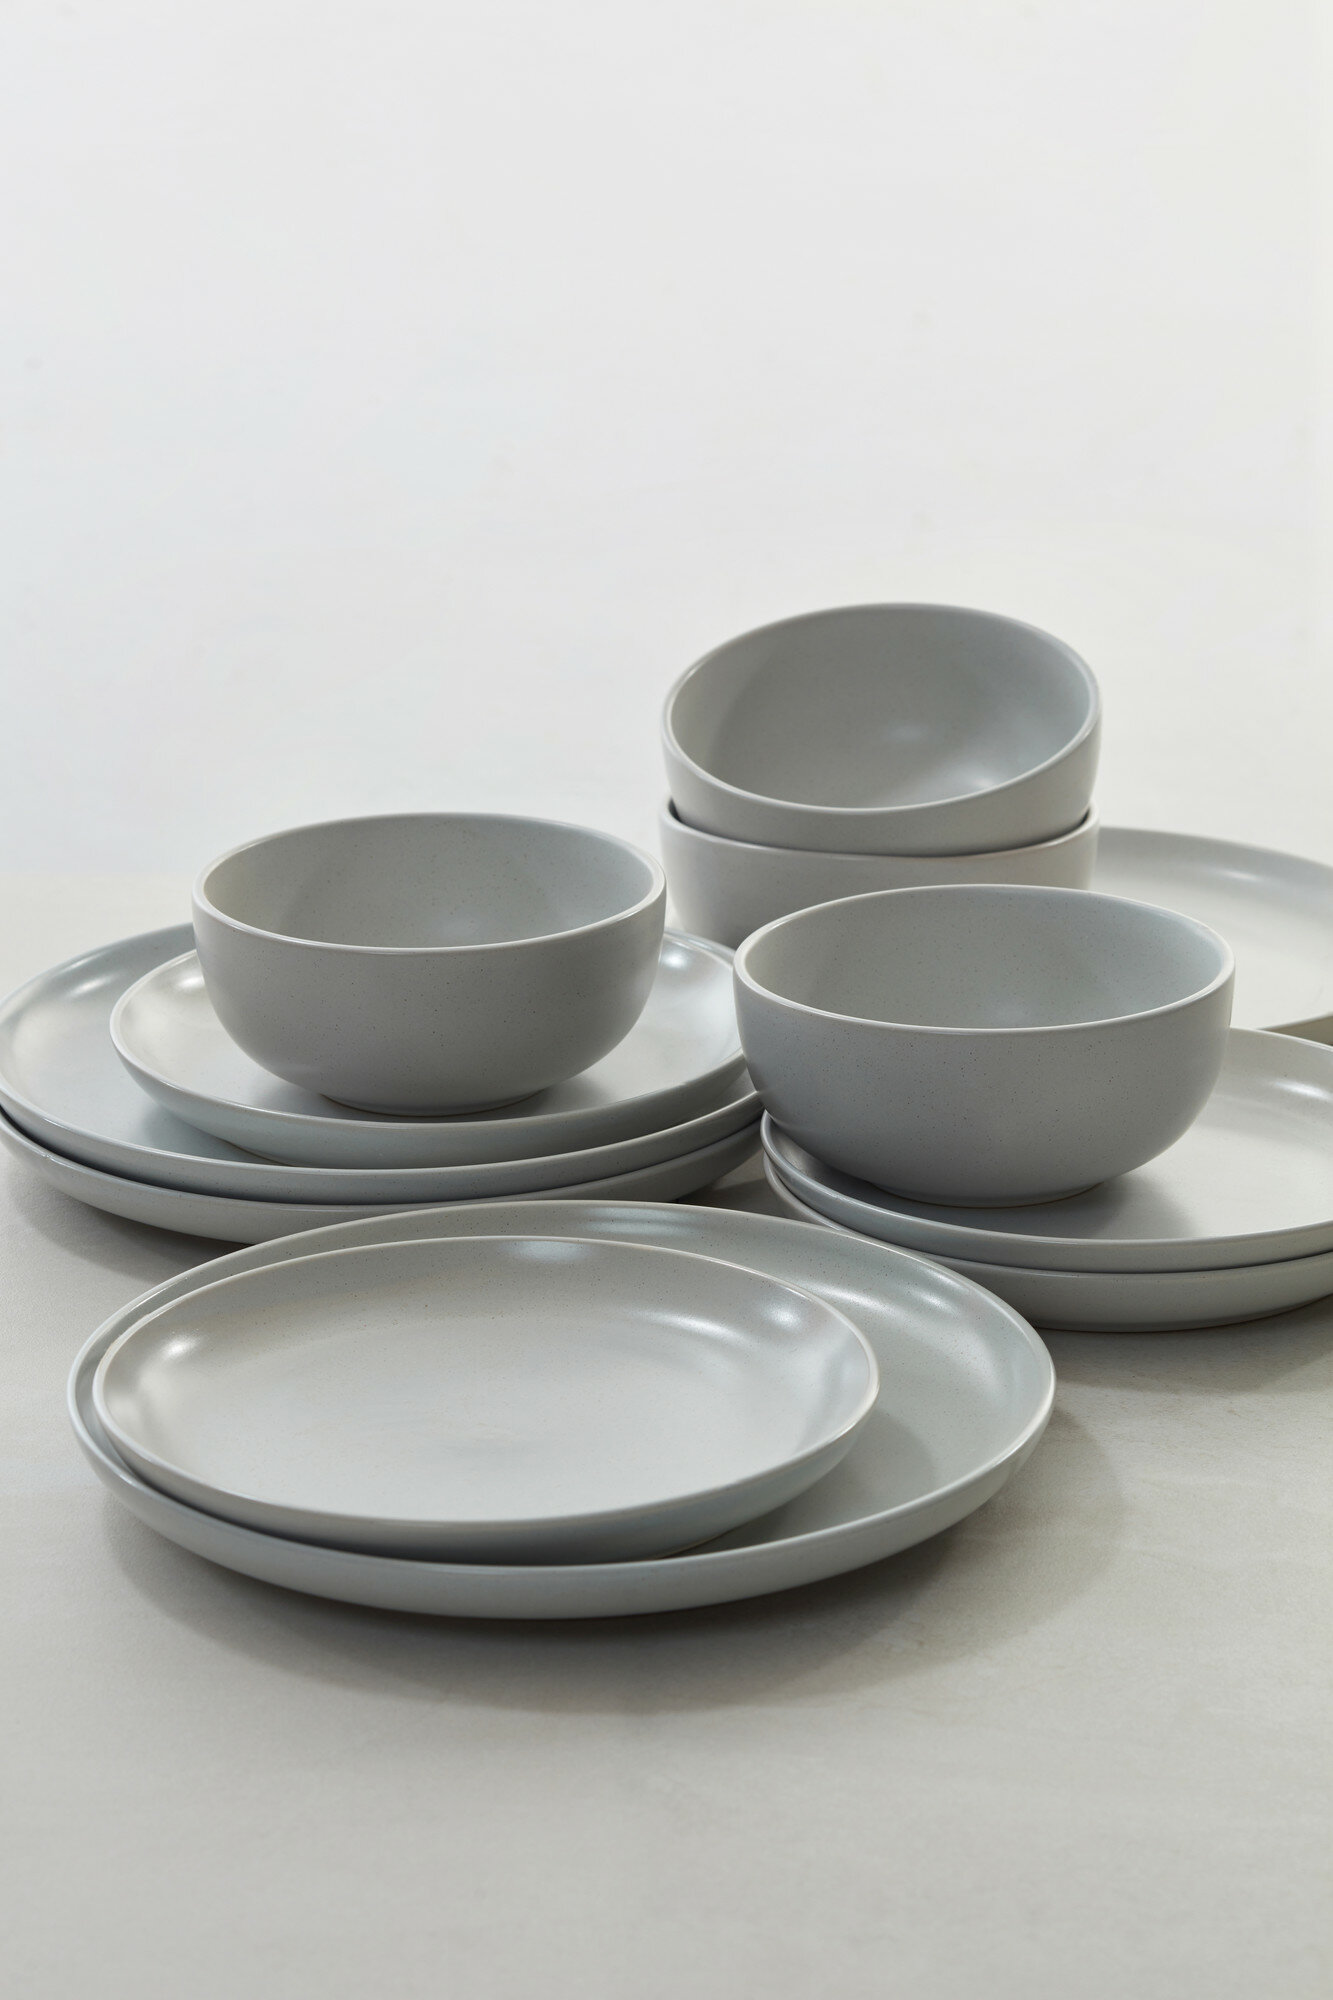 Jamie Oliver 12 Piece Stoneware